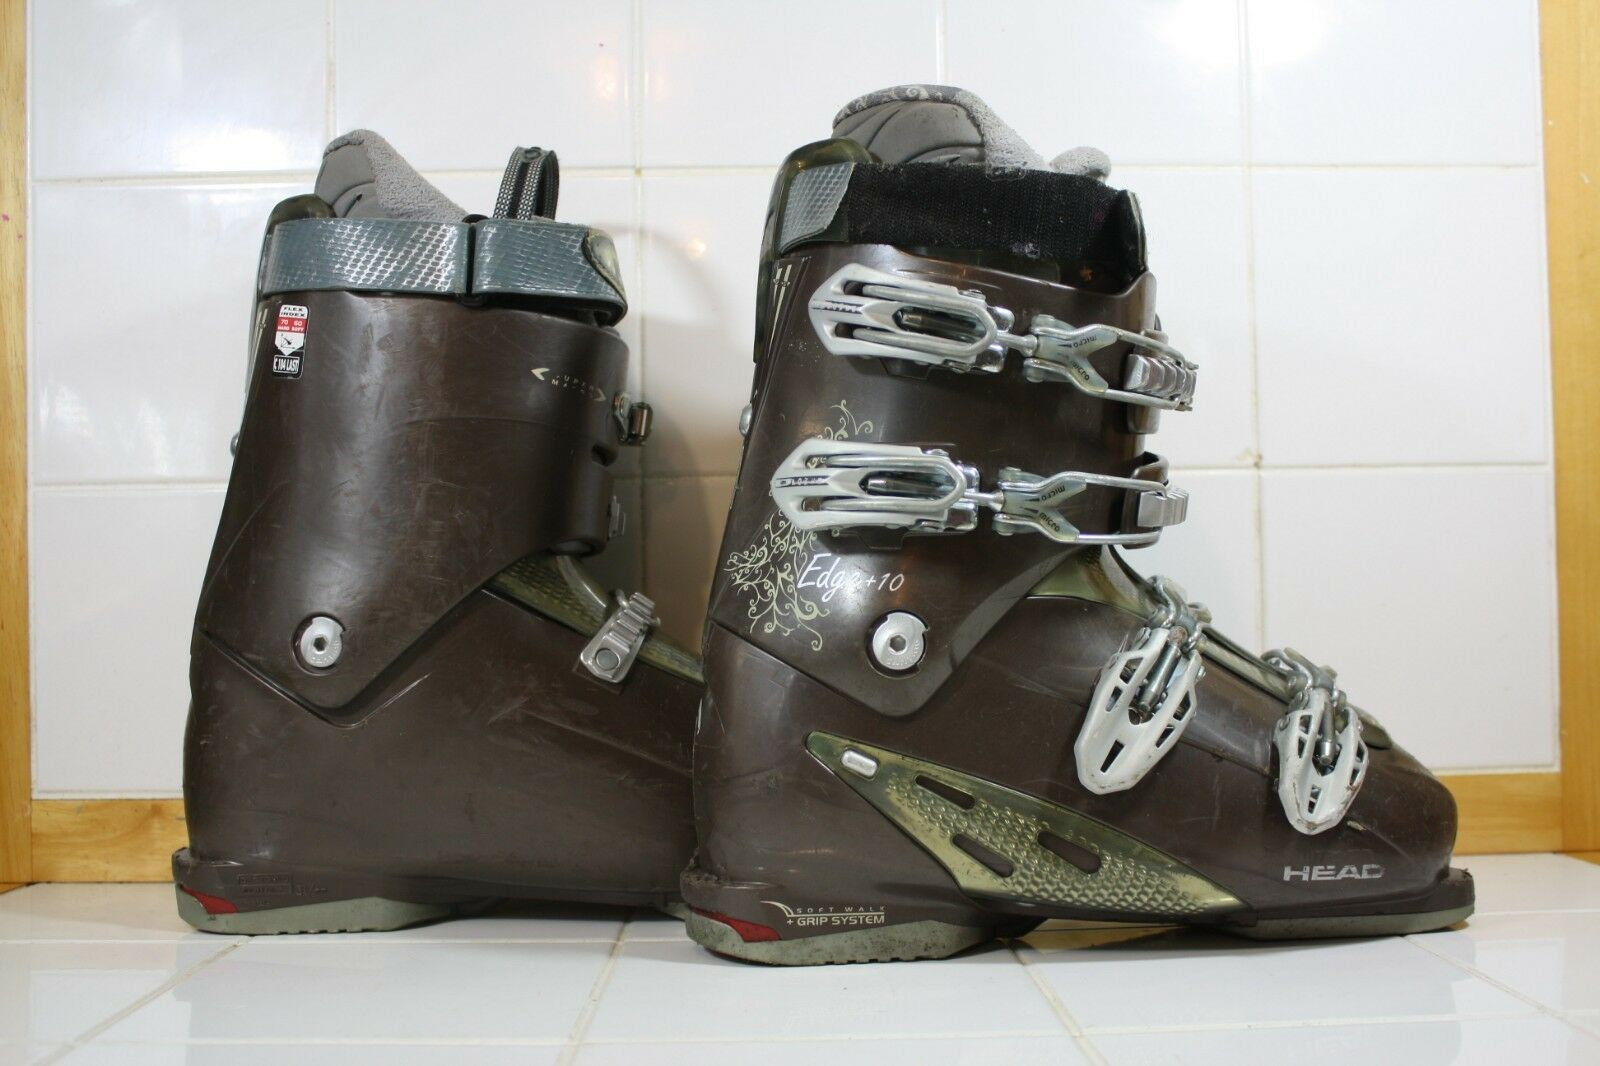 Head Edge Ski Boots - Mondo 27.5 -   Lot 1487